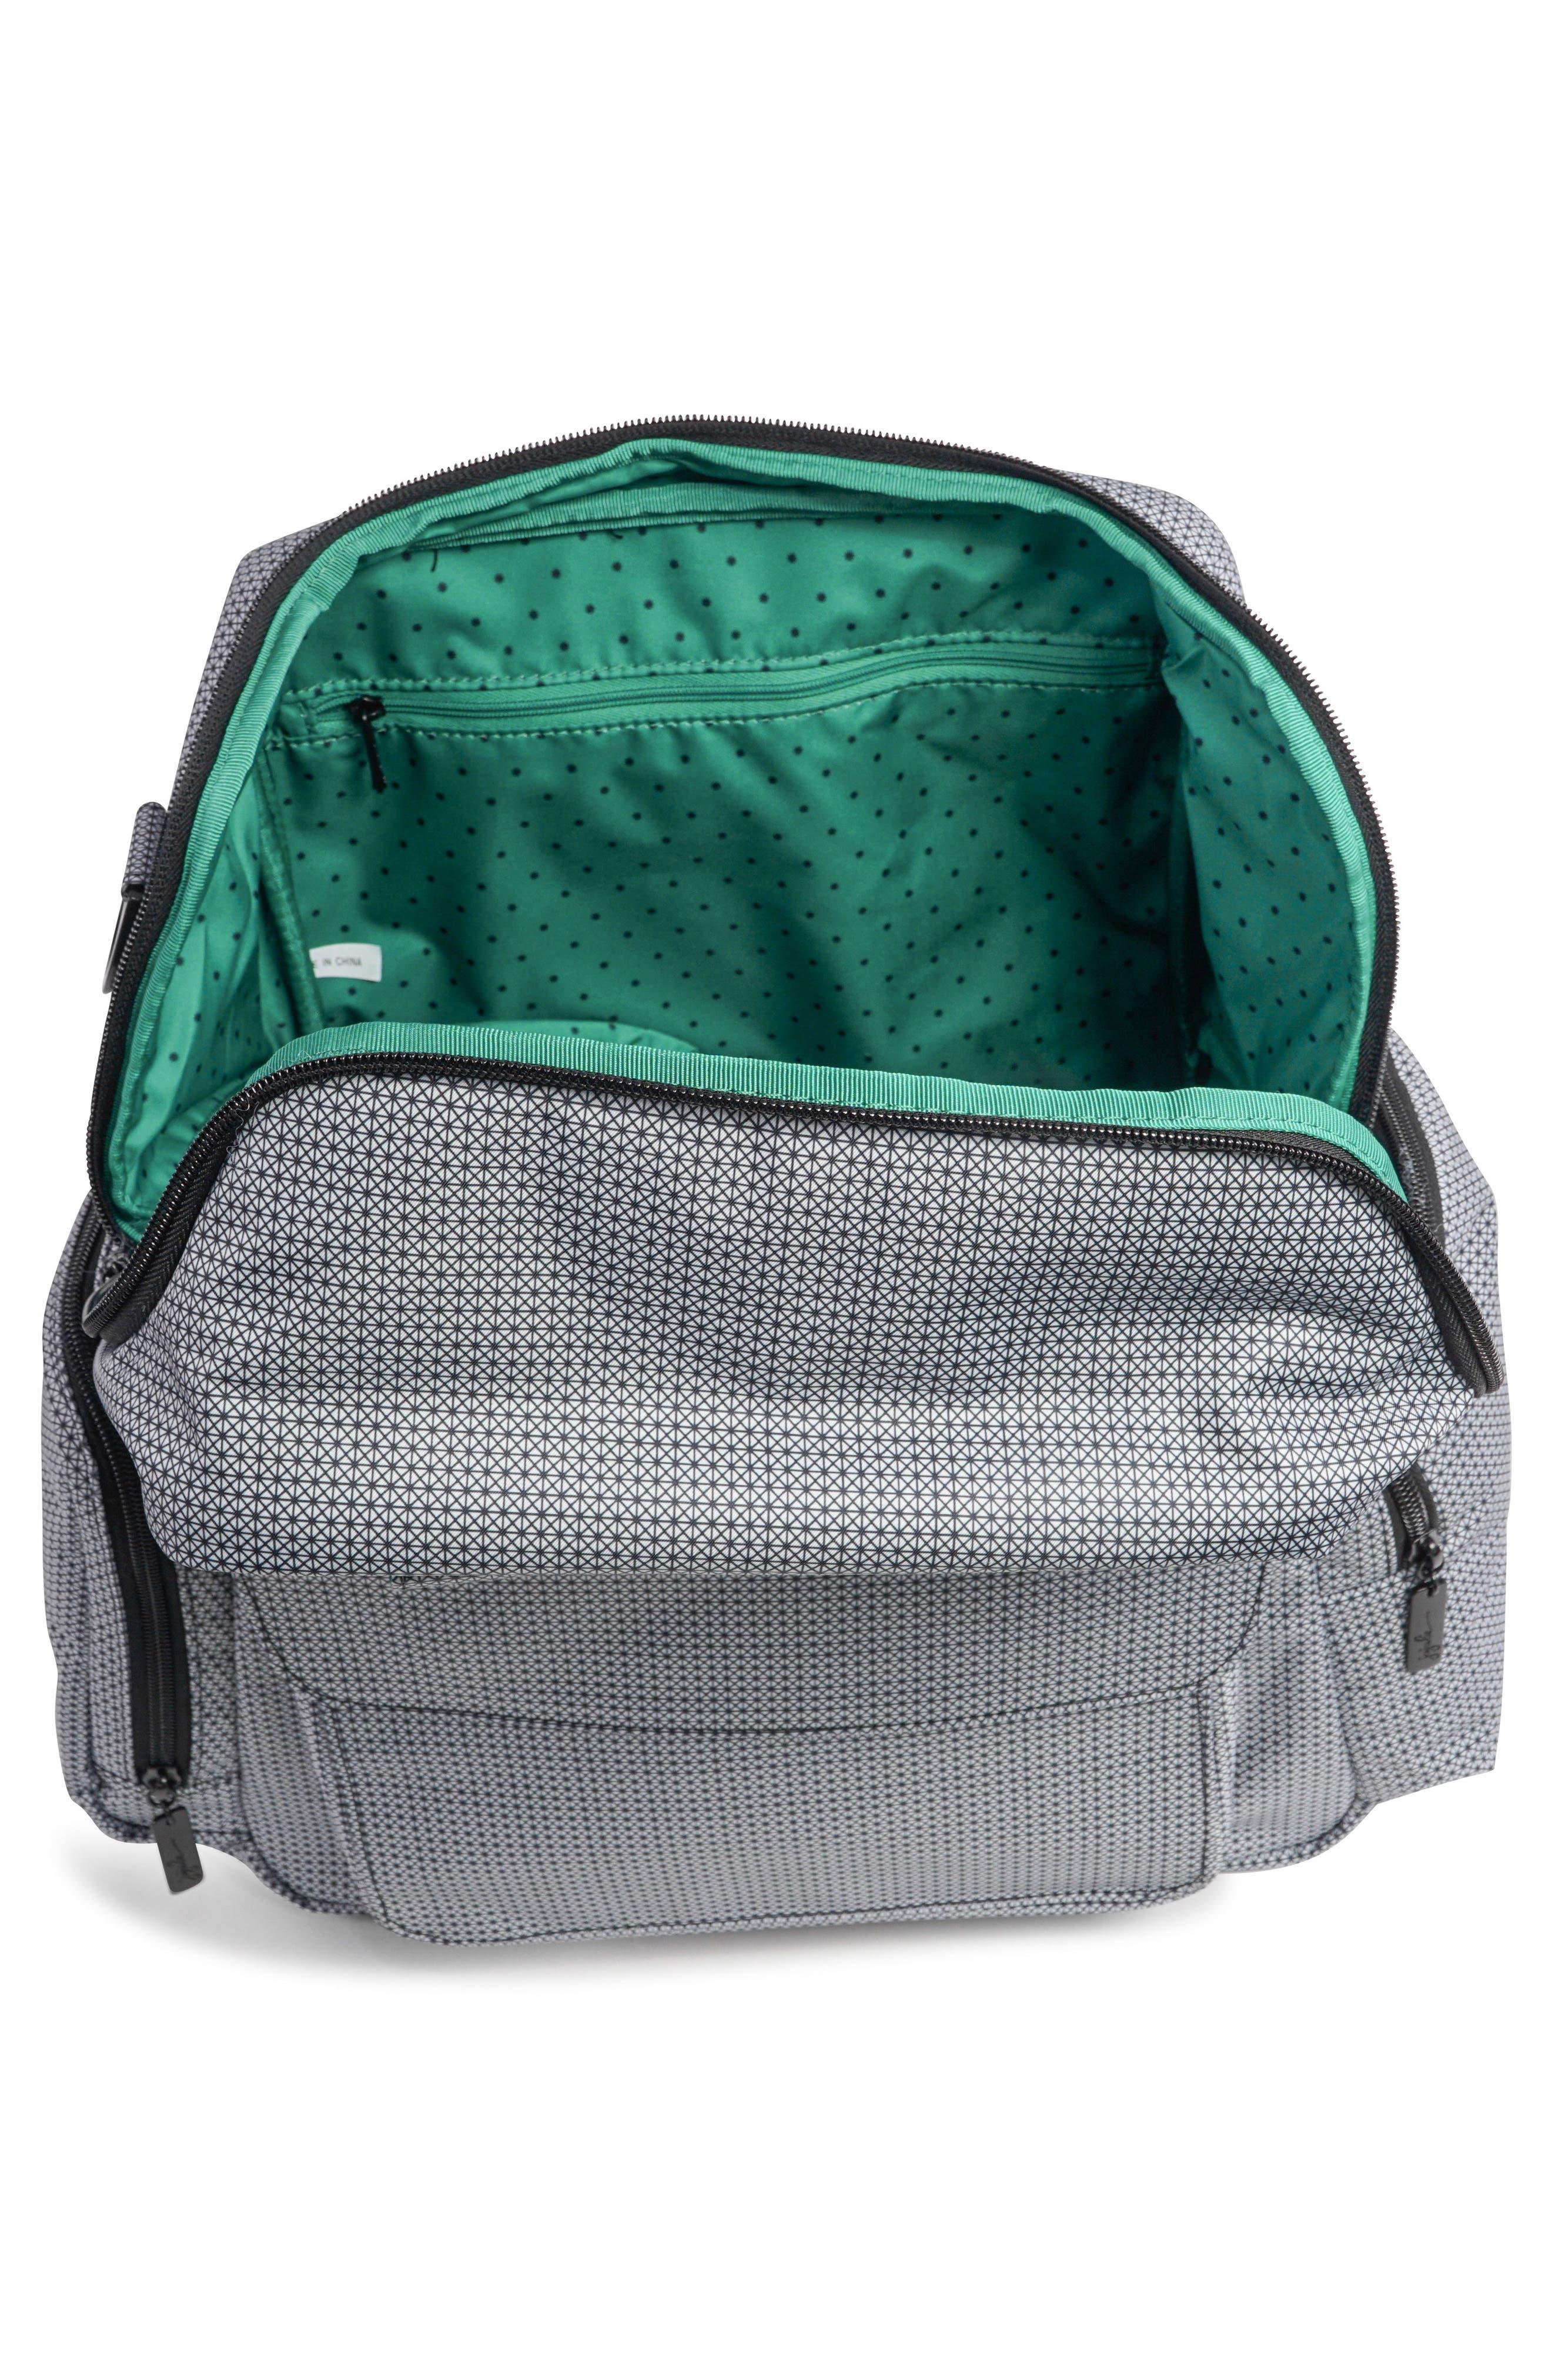 Be Nurtured Pumping Backpack,                             Alternate thumbnail 4, color,                             BLACK MATRIX